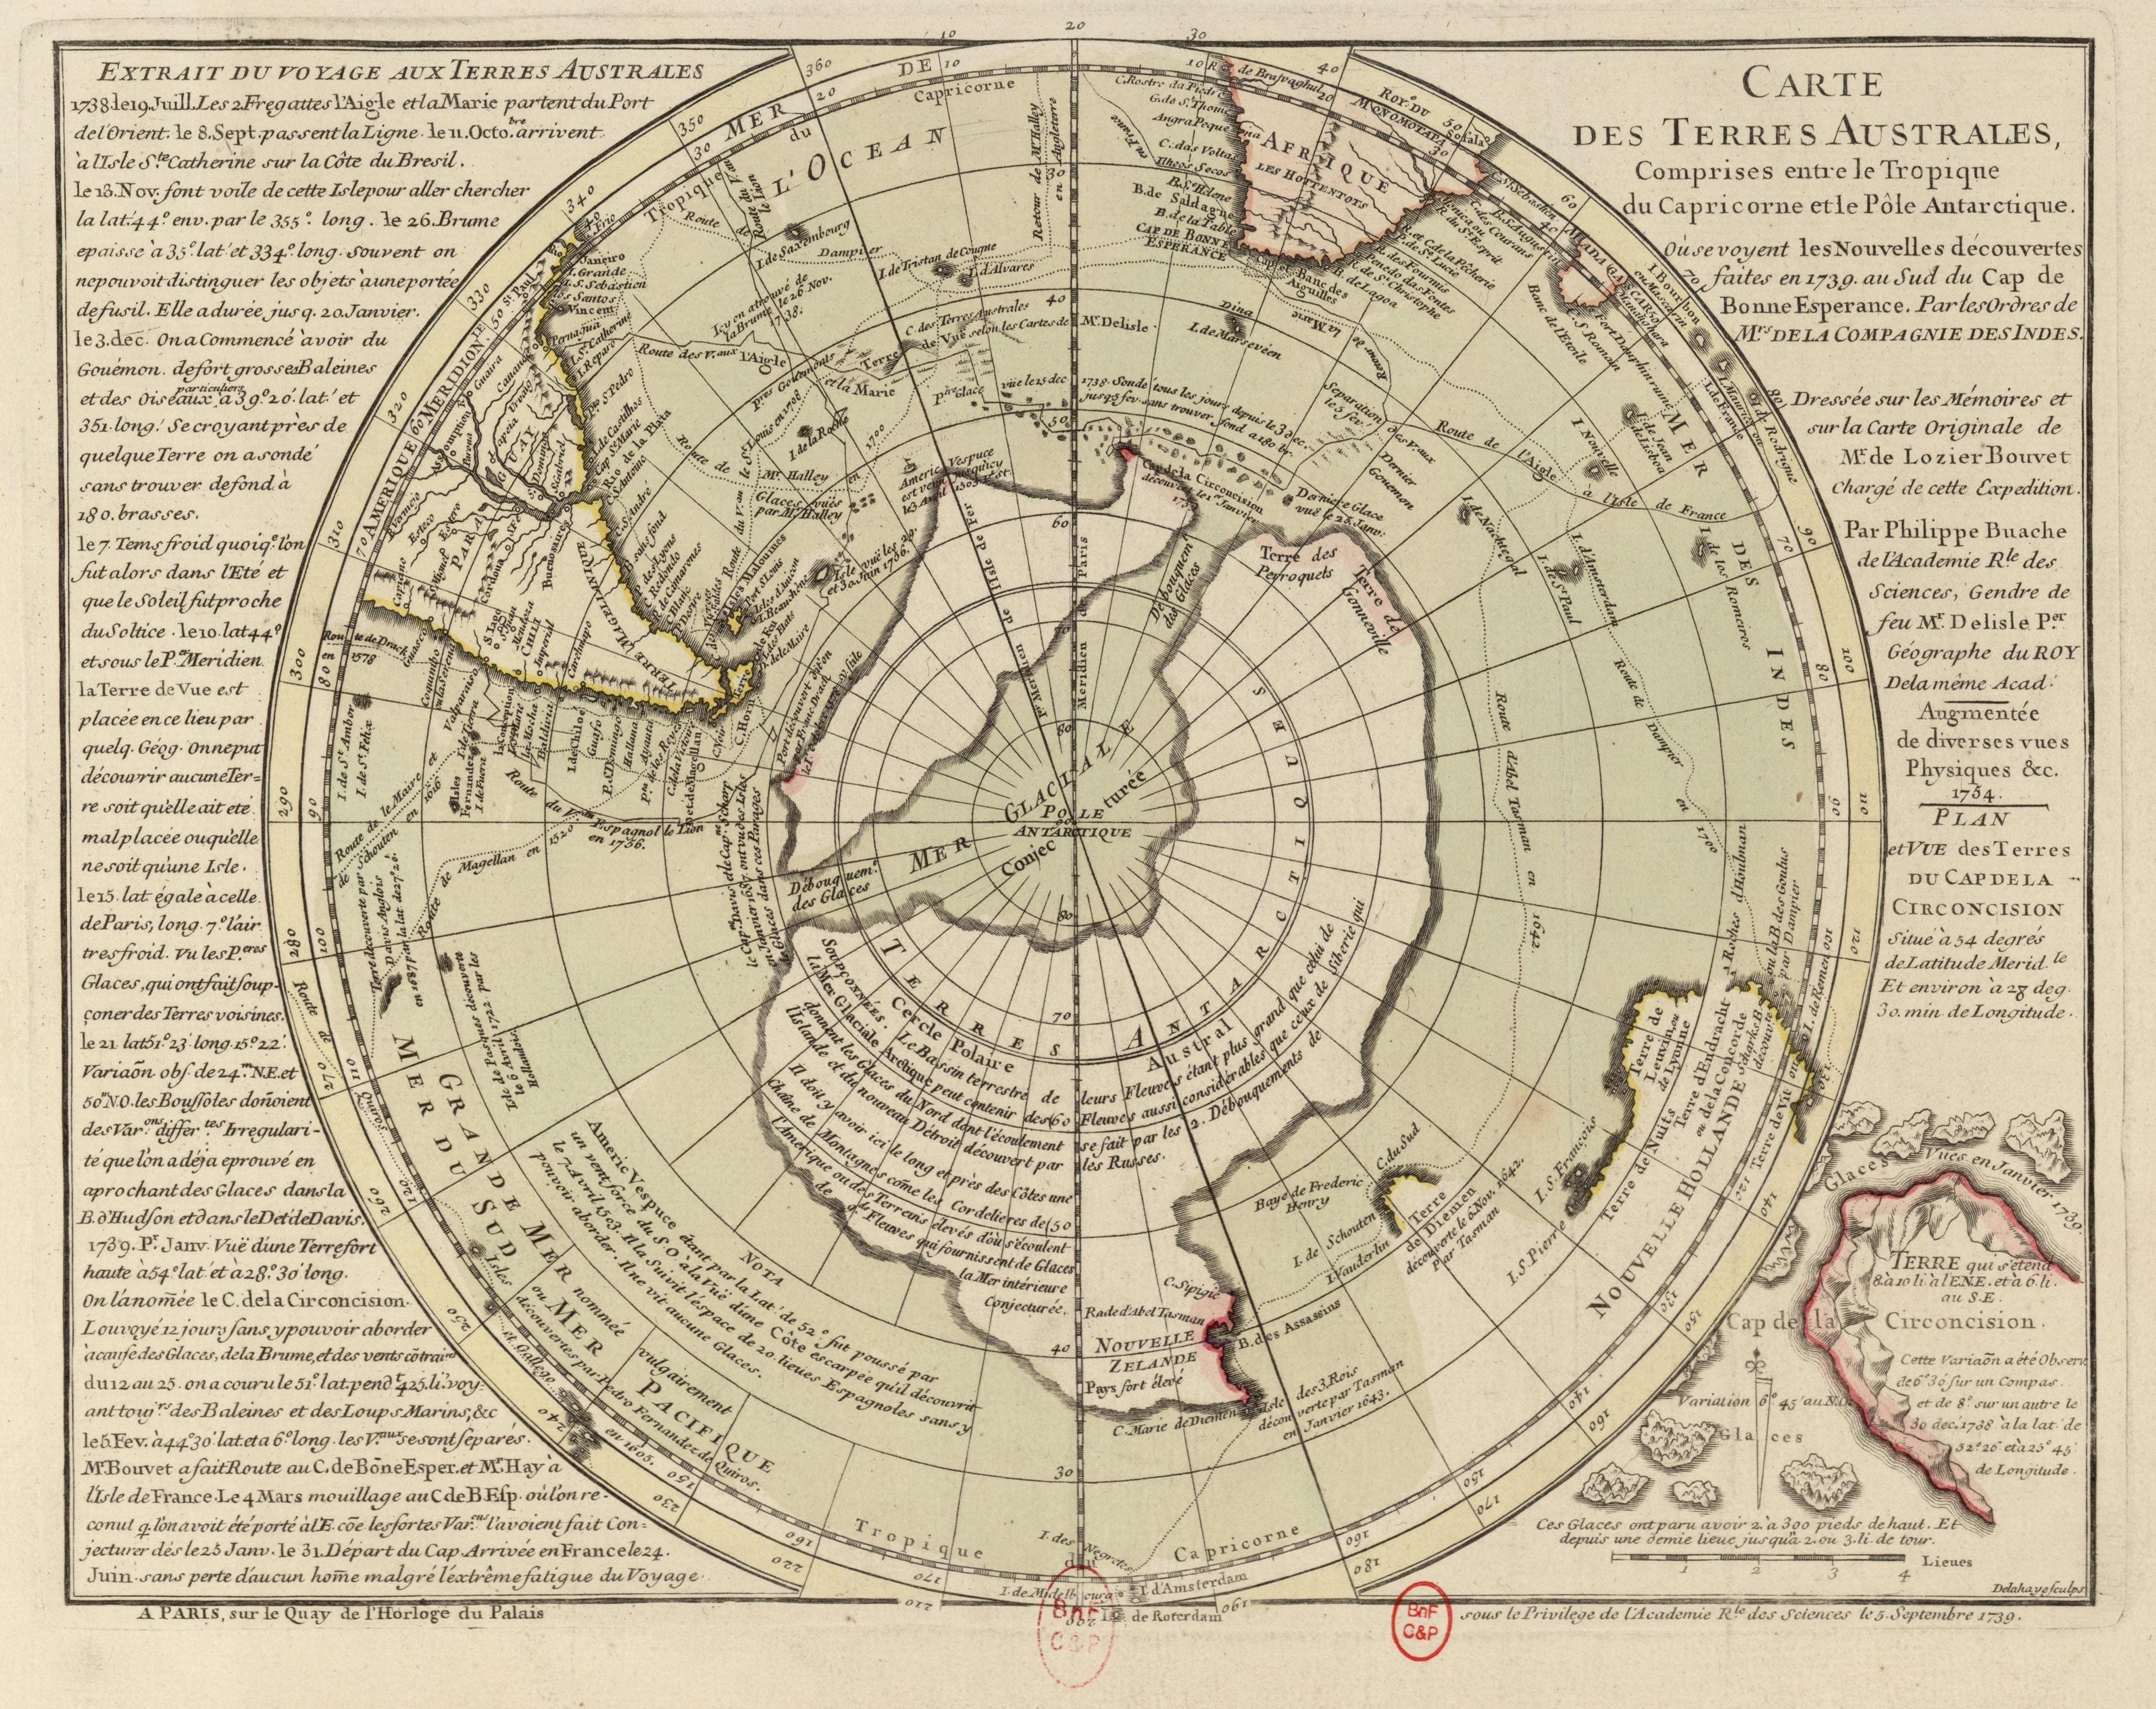 Antarctica,_Bouvet_Island,_discovery_map_1754.jpg